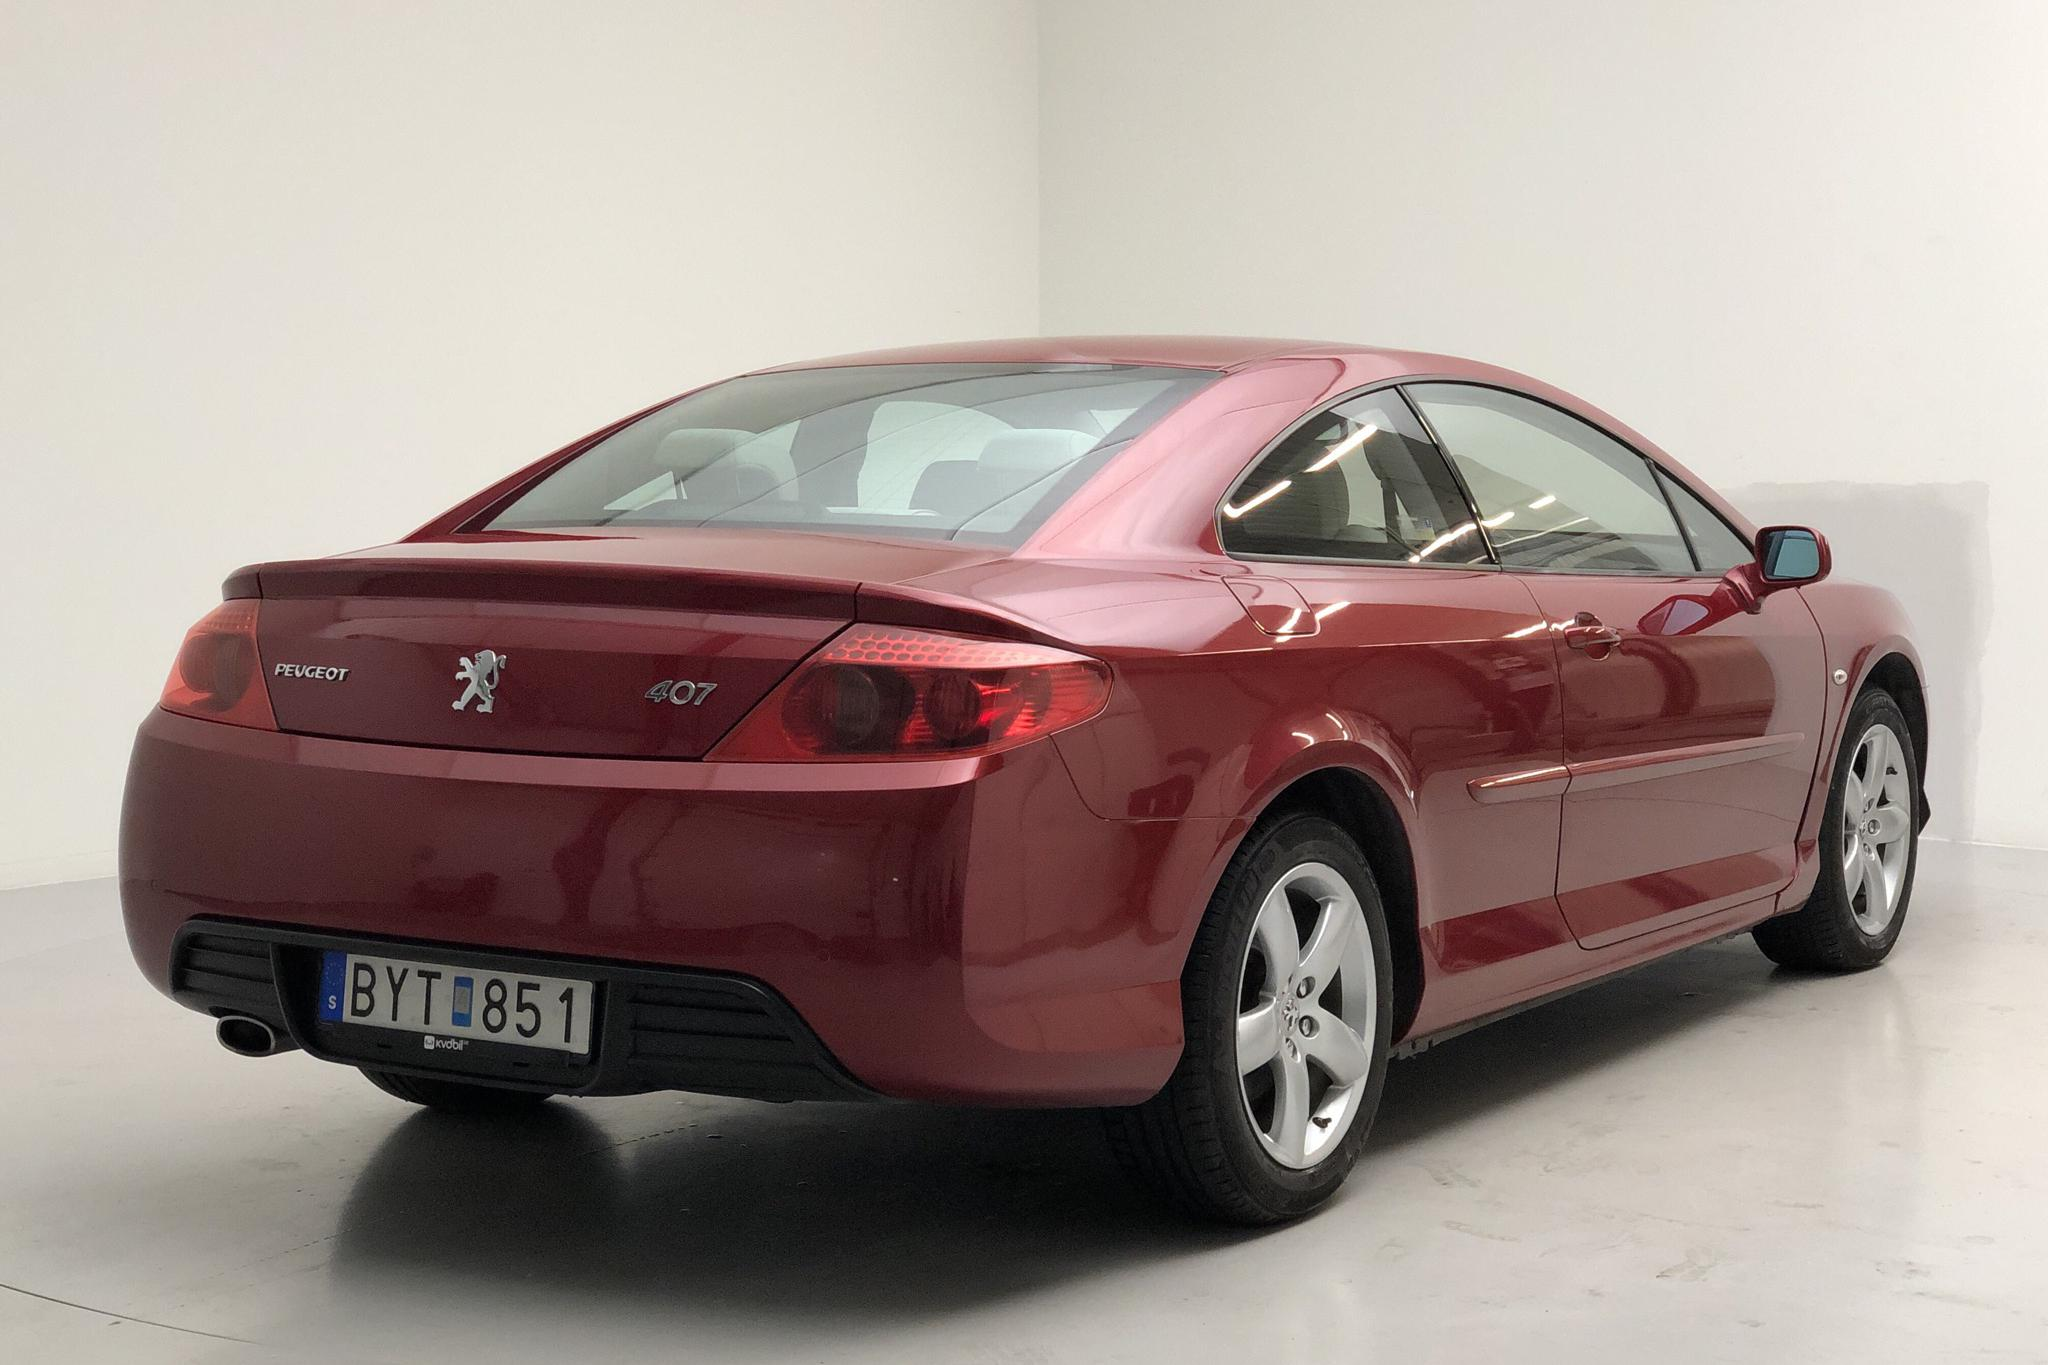 Peugeot 407 2.2 Coupé (163hk) - 6 925 mil - Manuell - Dark Red - 2006